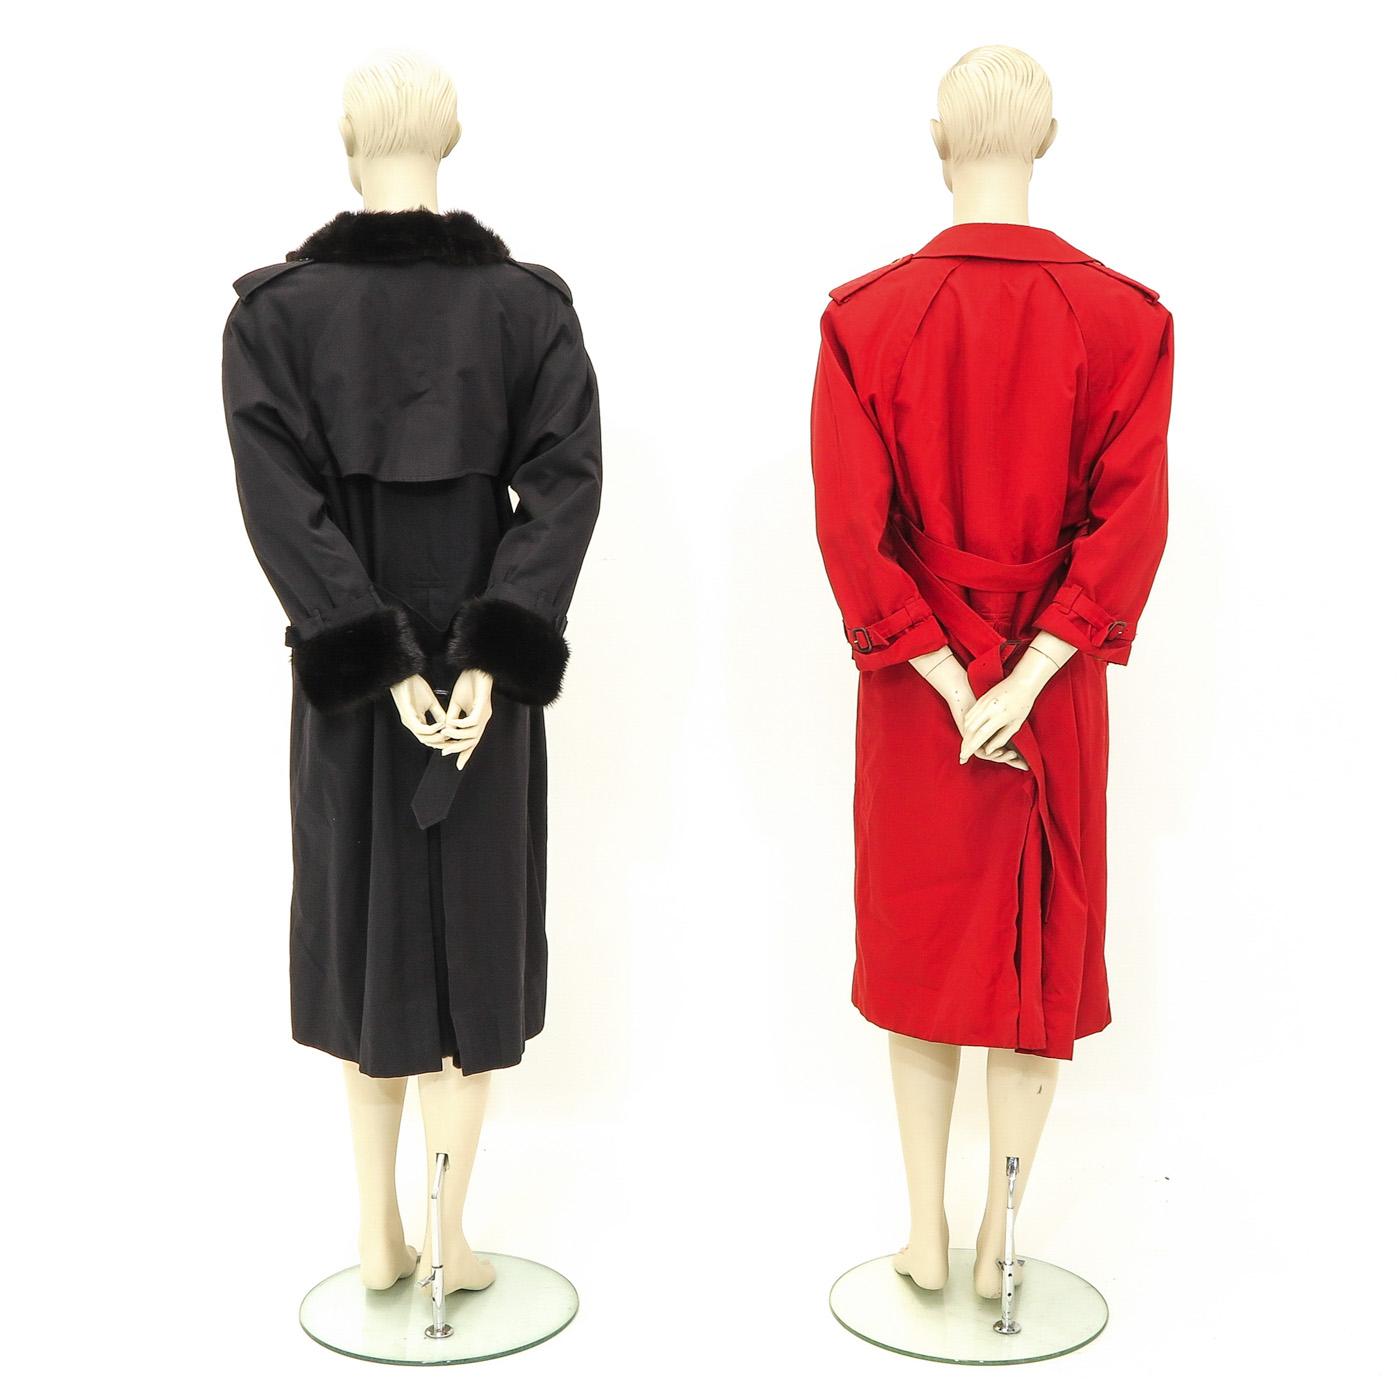 Lot 1143 - Two Designer Coats